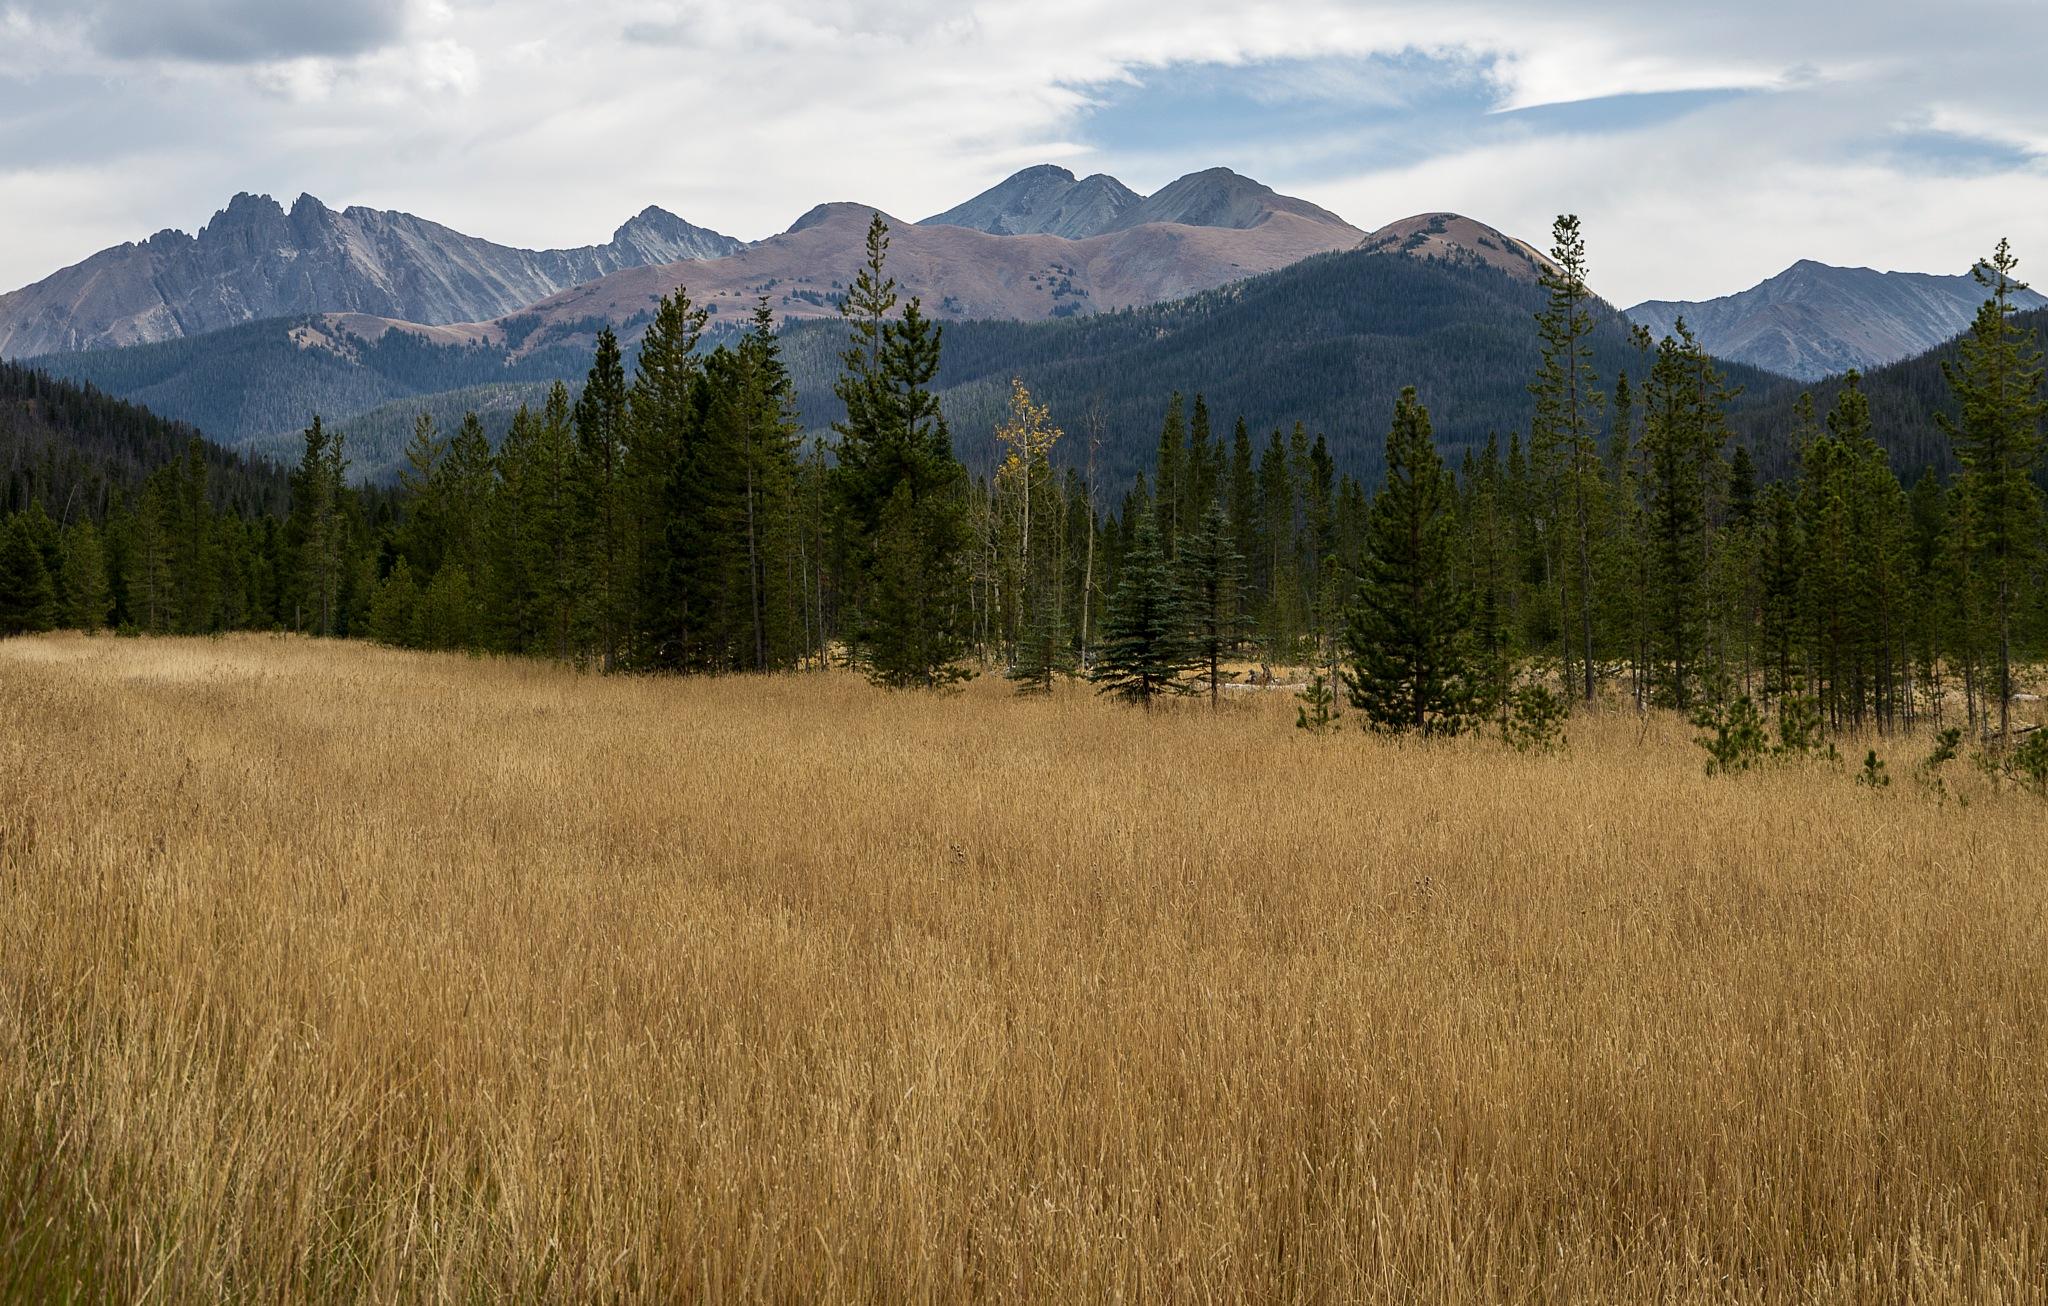 Colorado Fall #2 by junkitz01